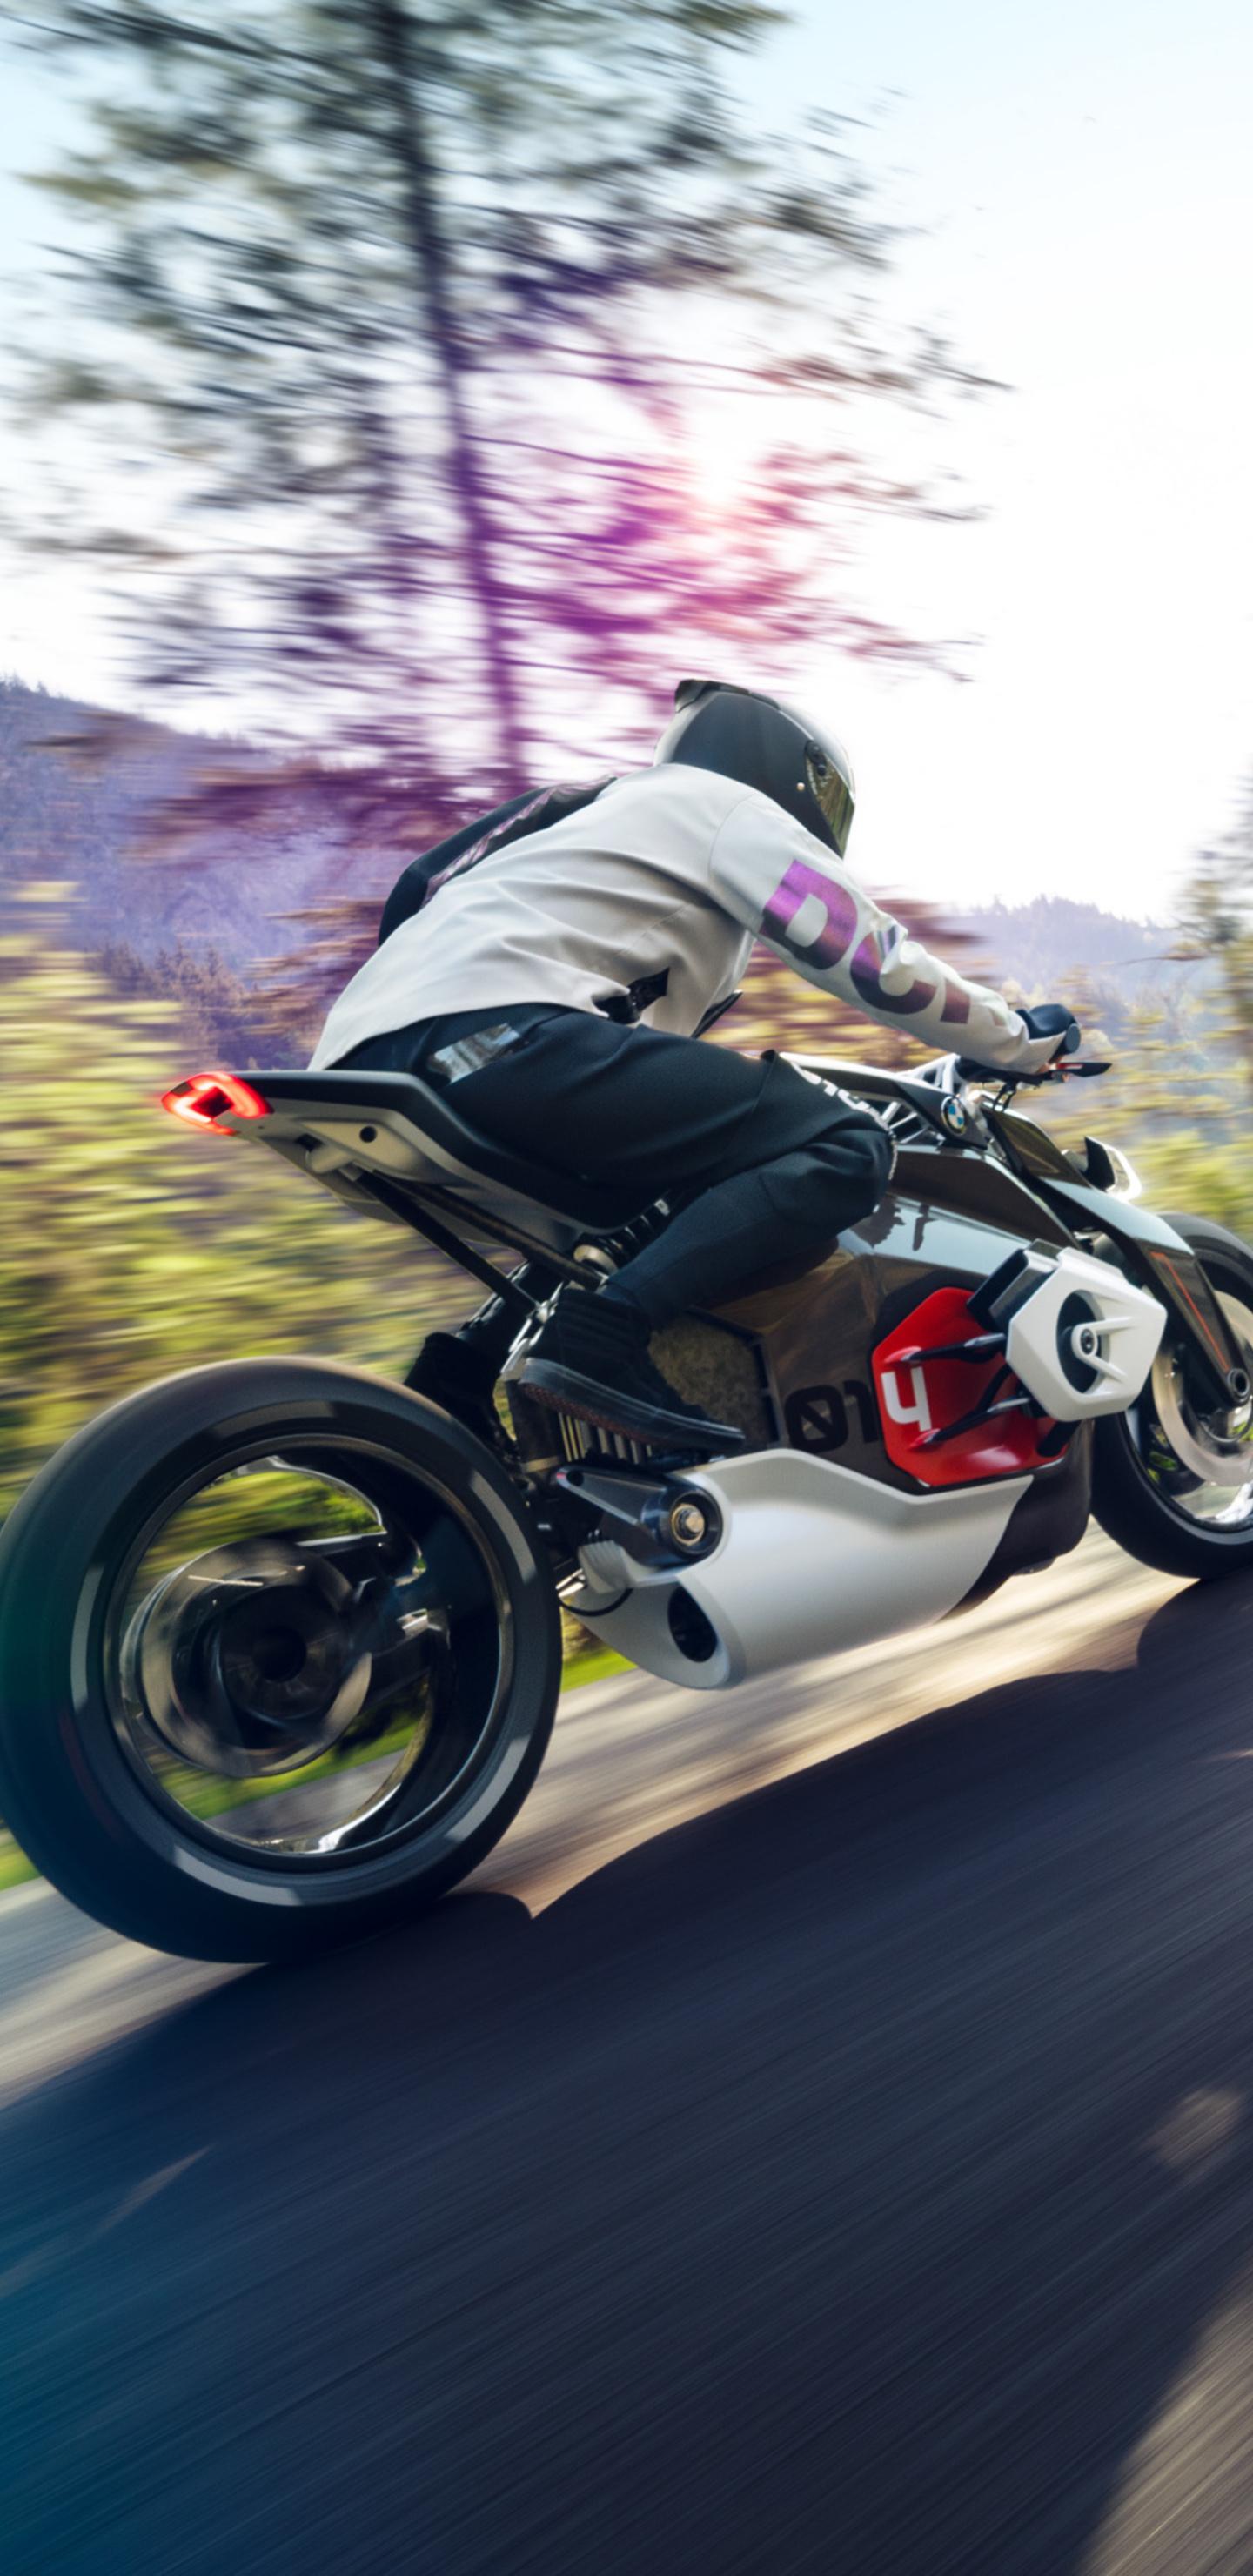 bmw-vision-dc-roadster-electric-bike-concept-wg.jpg